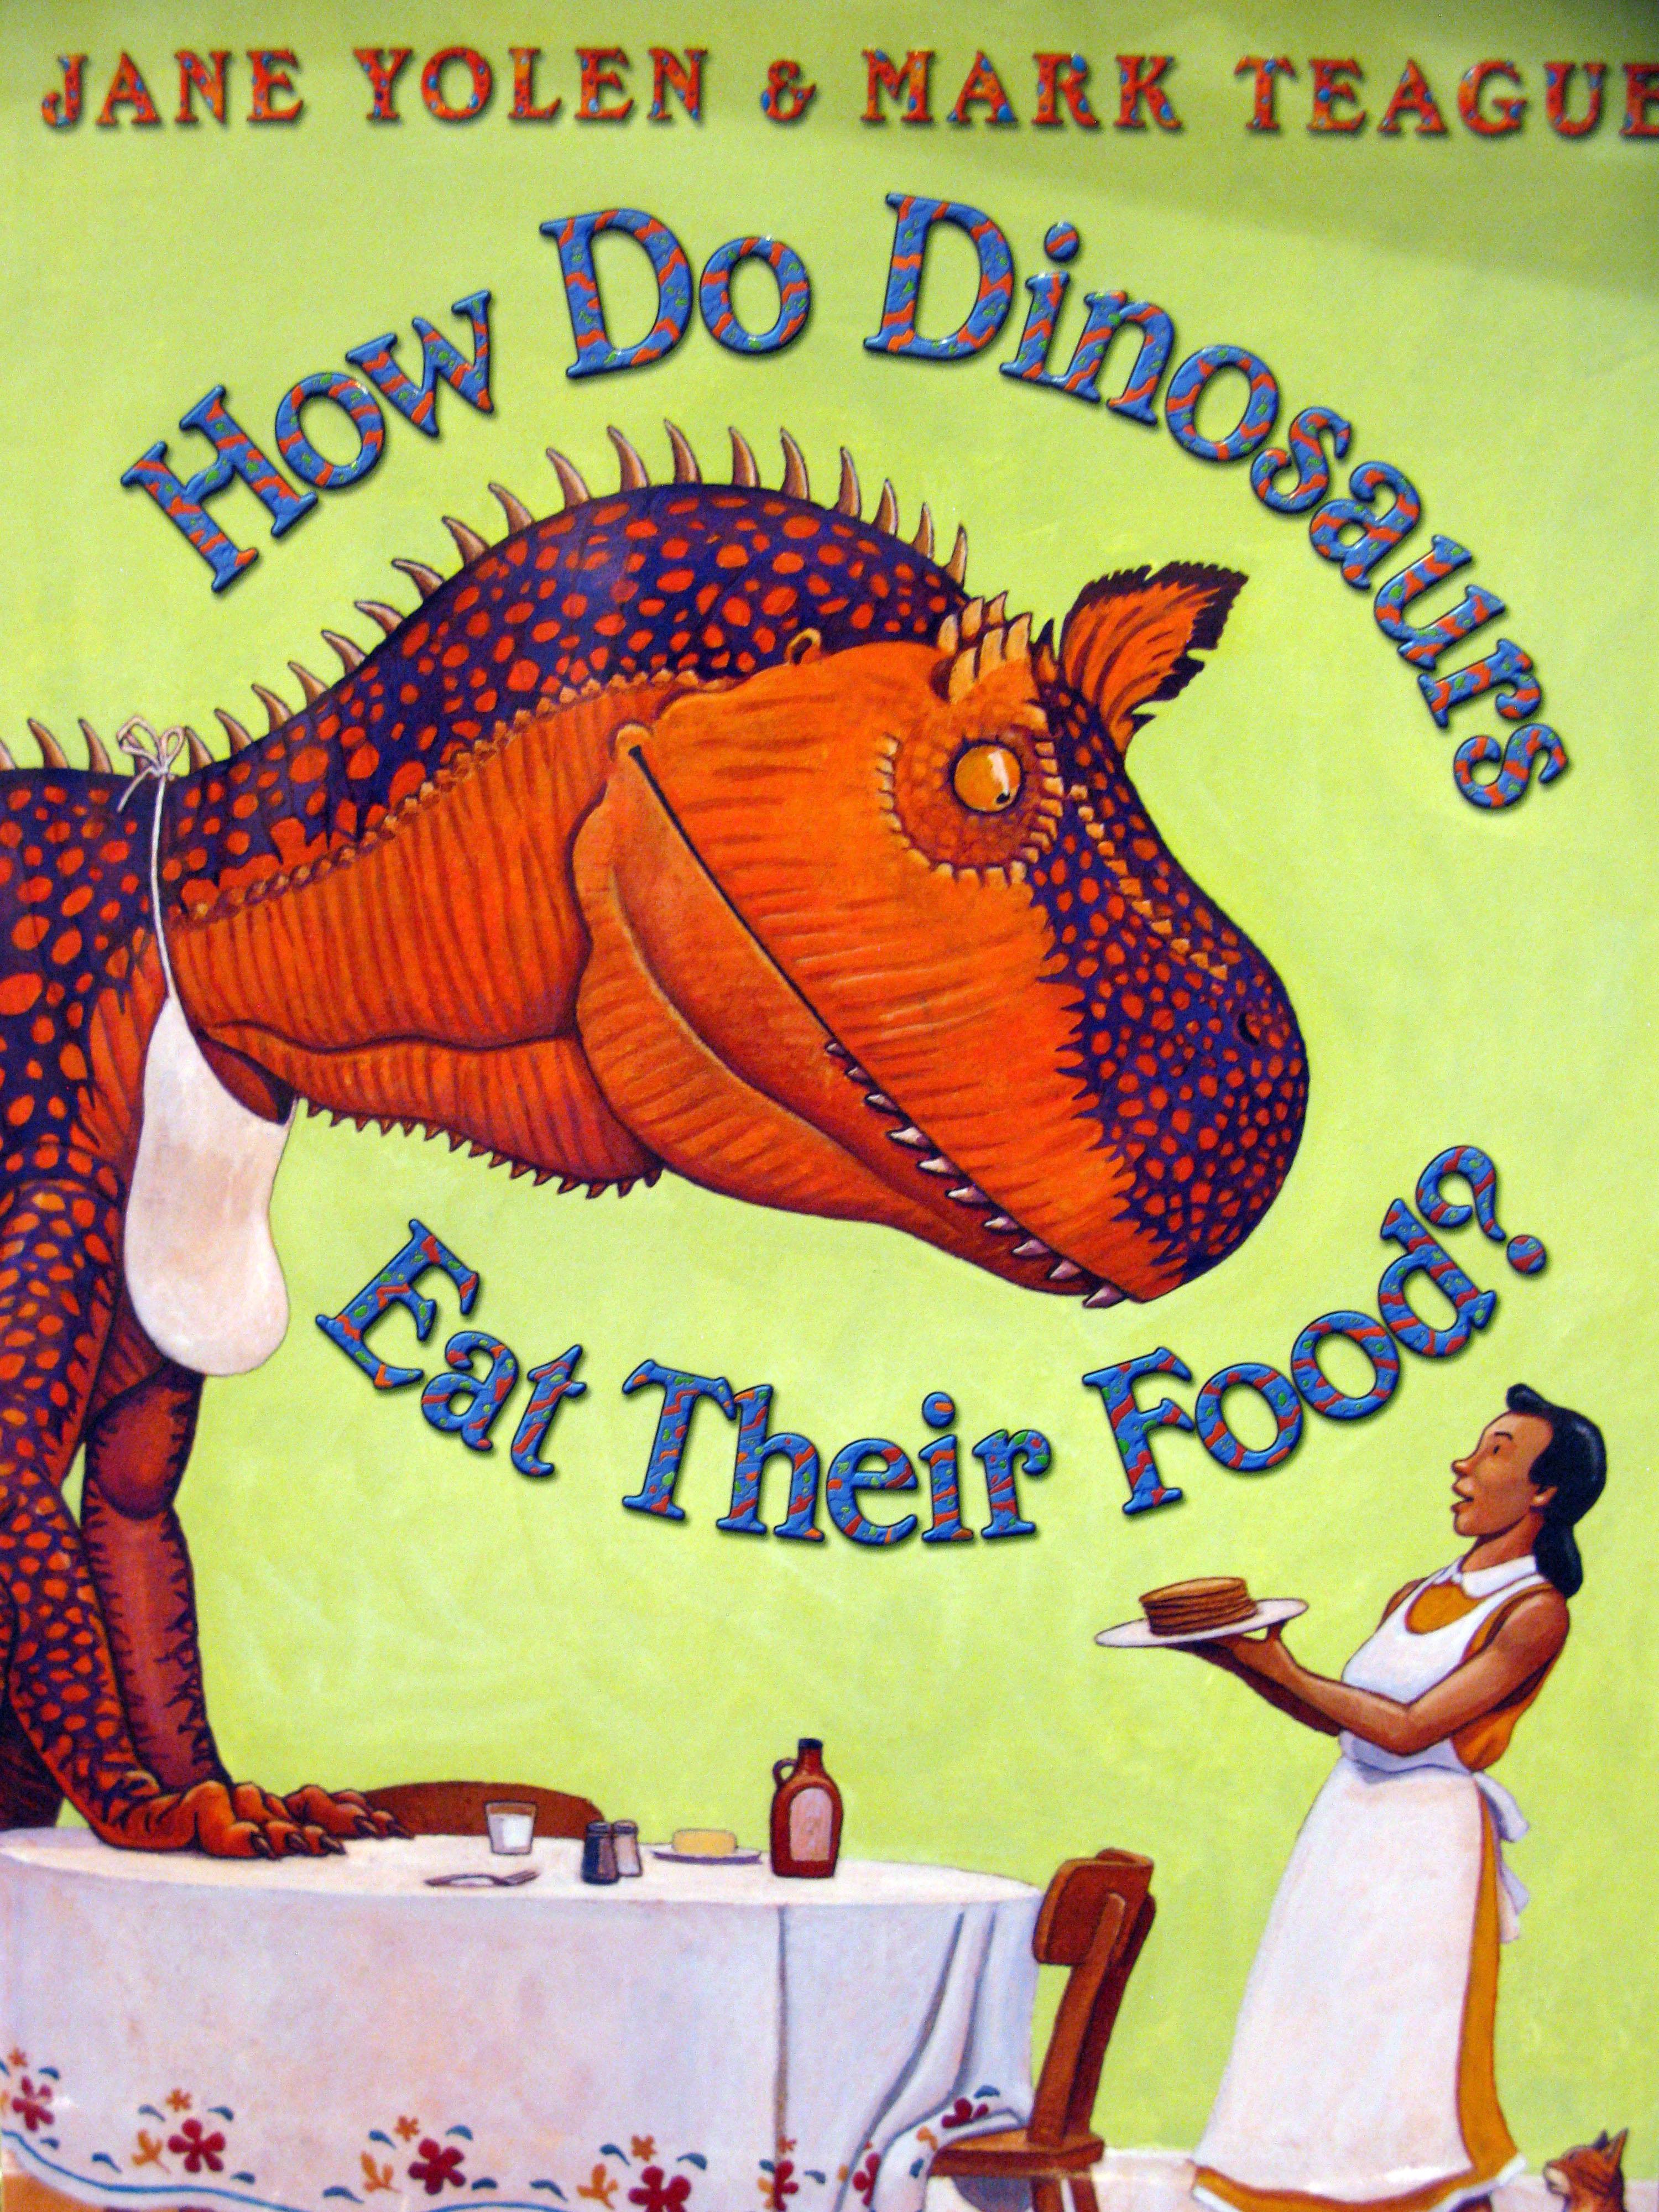 AMNH Shop | How Do Dinosaurs Eat Their Food?